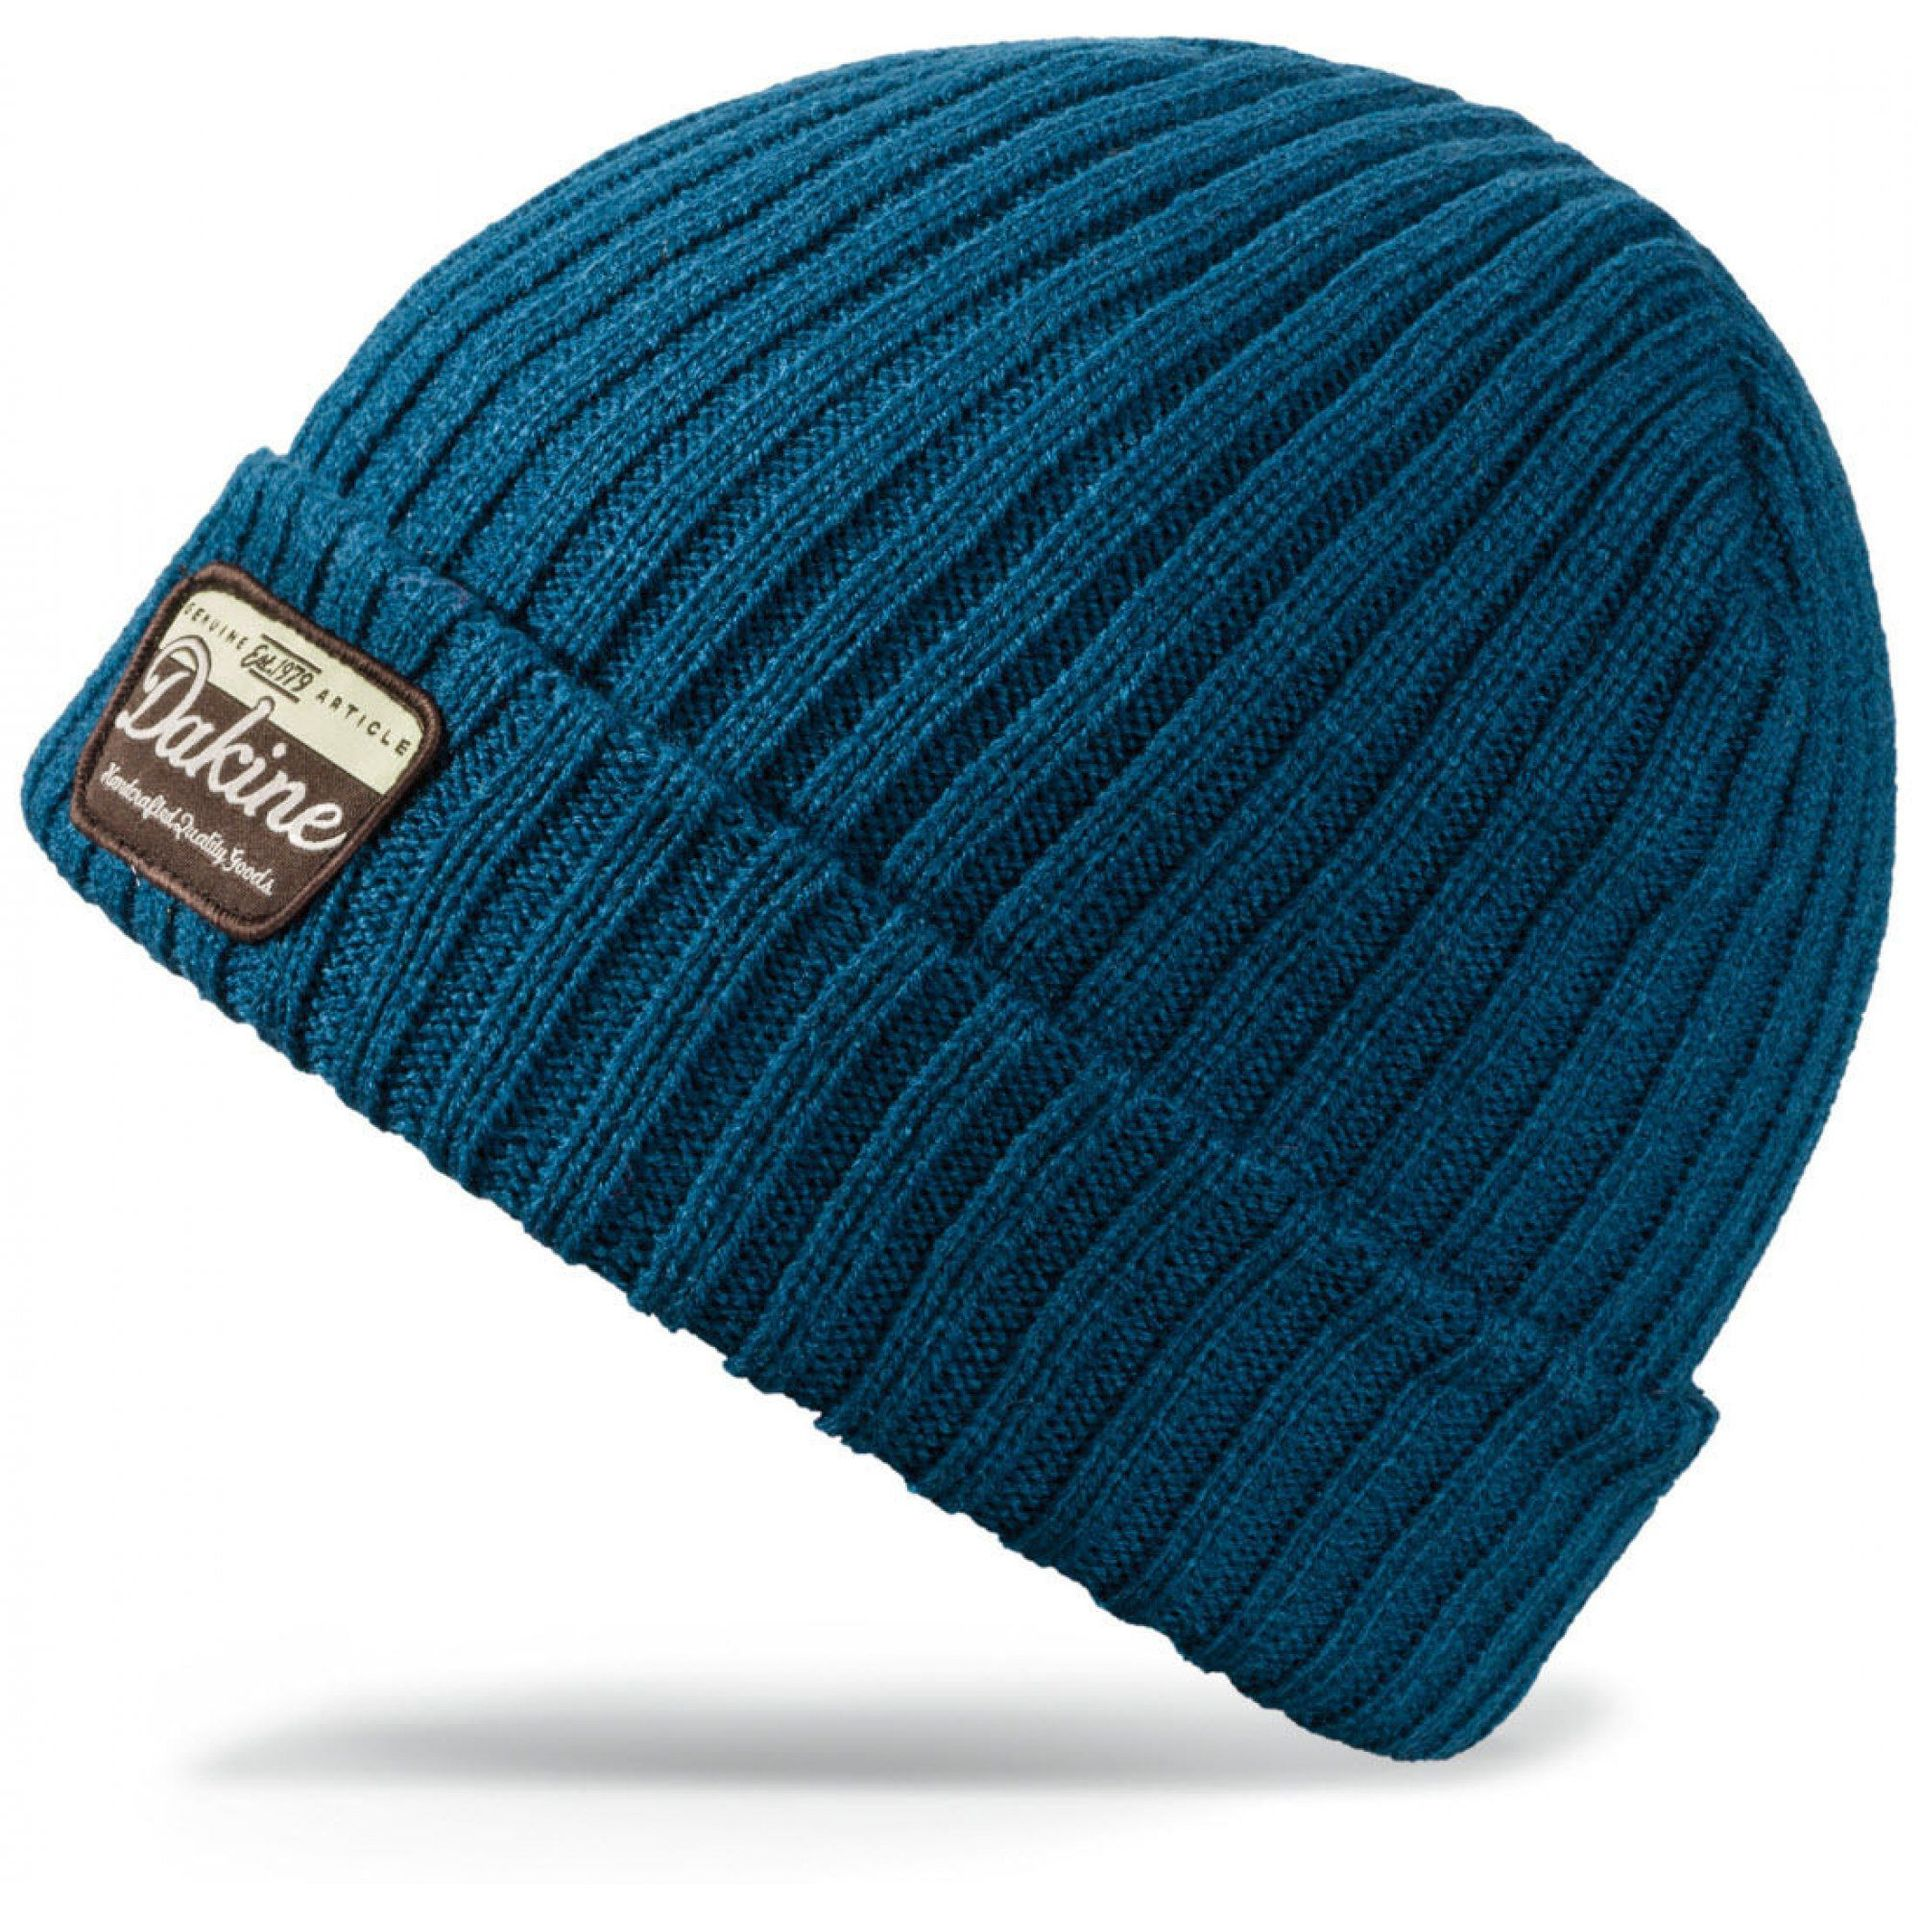 CZAPKA DAKINE SALLINGER MOROCCAN BLUE